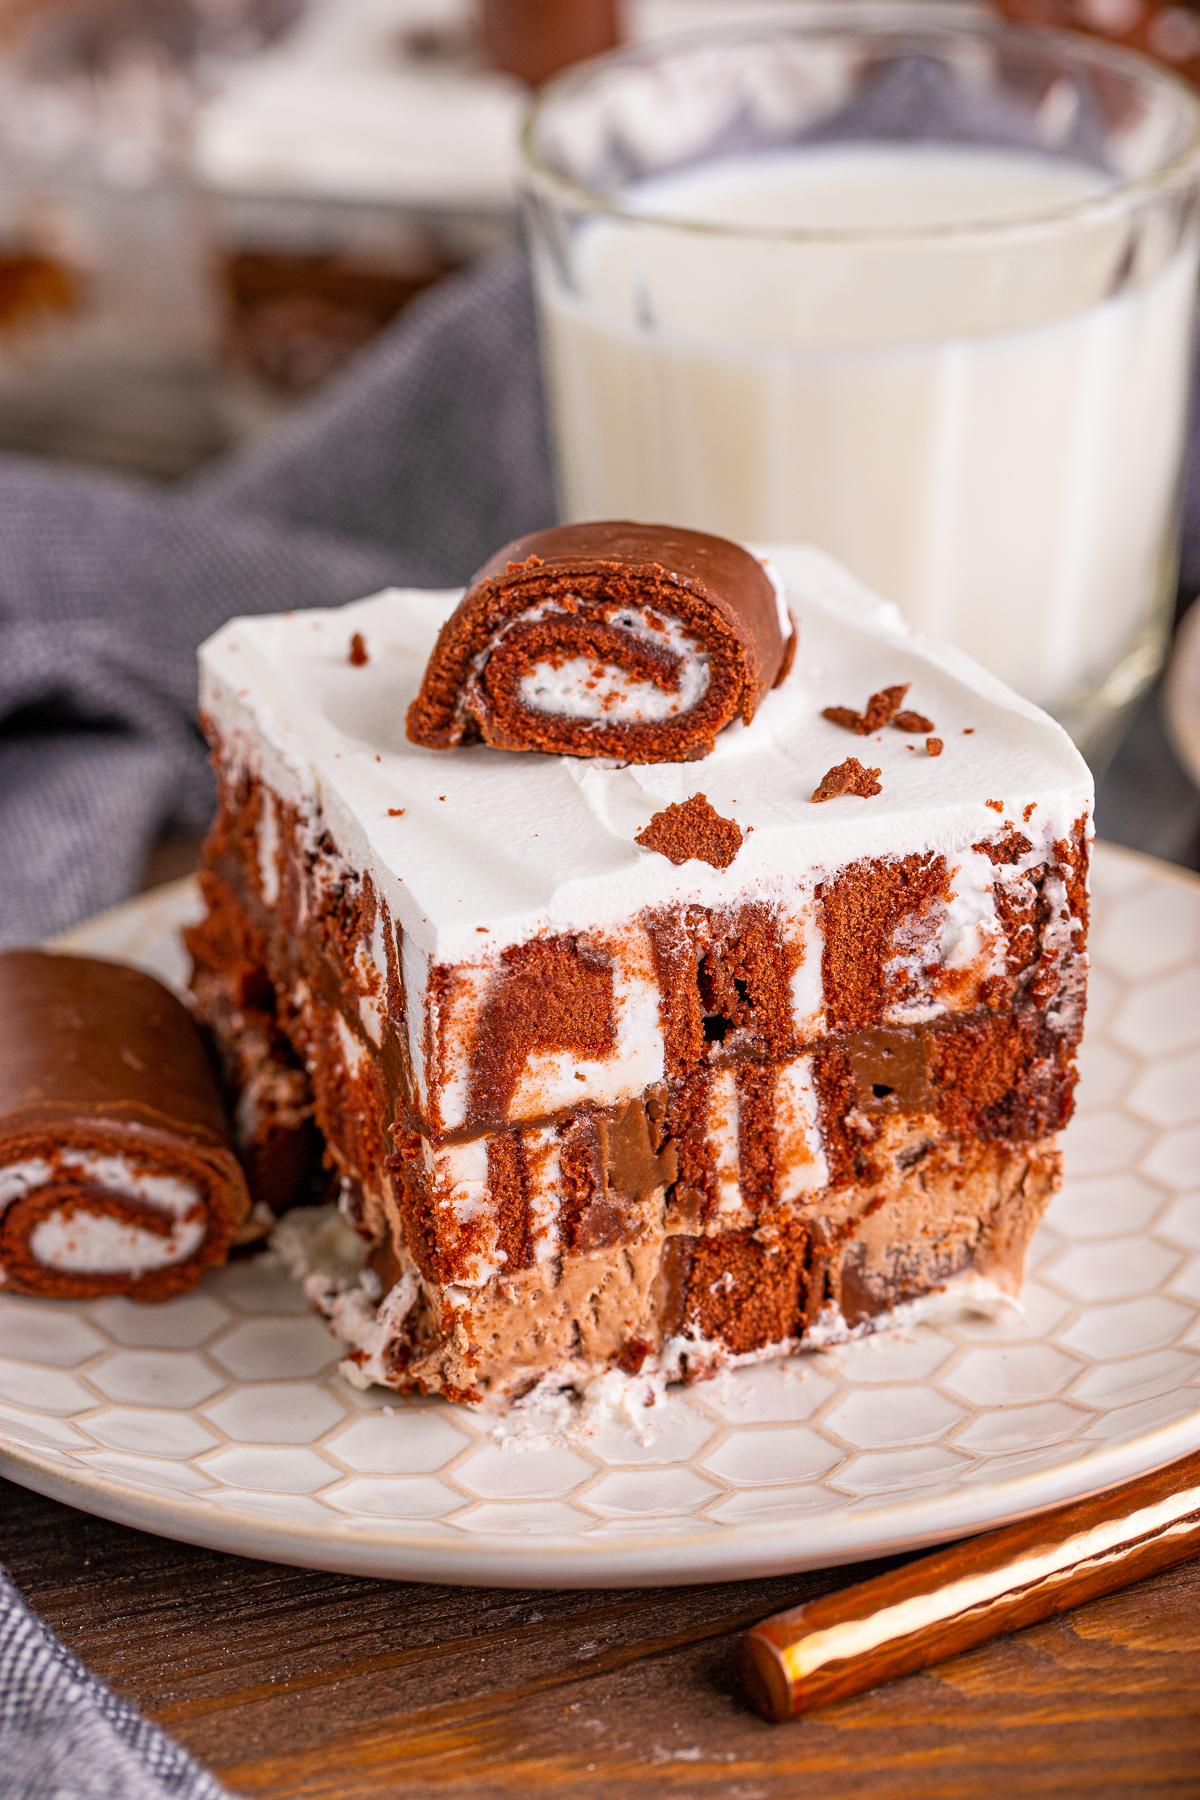 Slice of Swiss Cake Roll Lush Cake on patterned plate topped with slice of a swiss cake roll